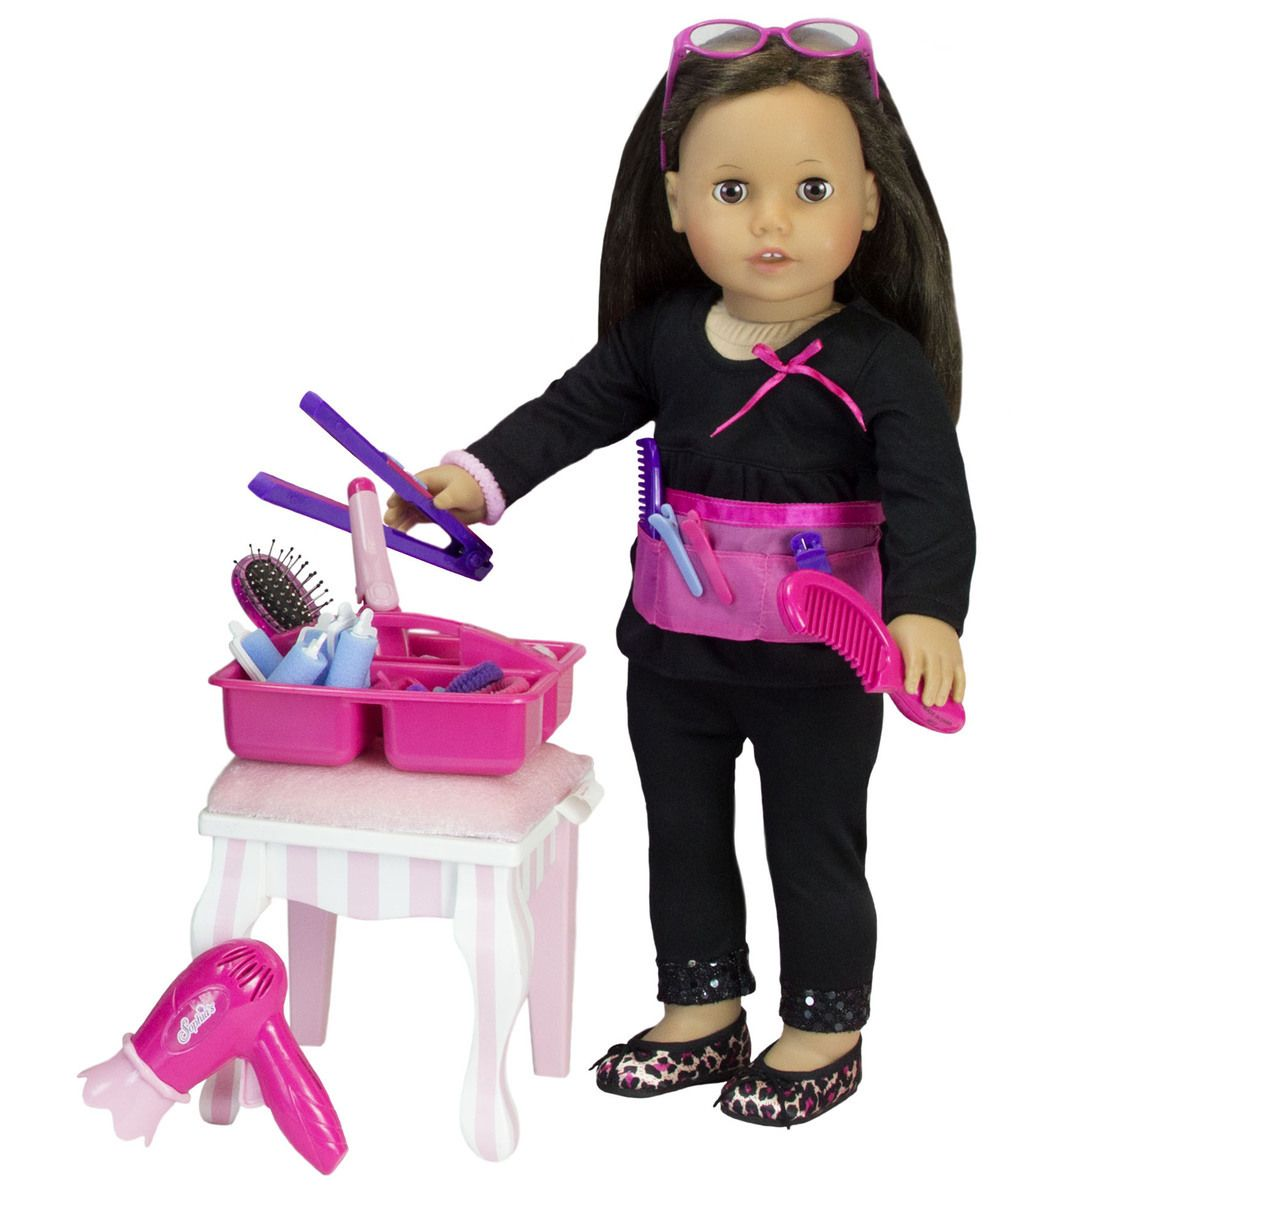 Hair Salon Set For 18 Inch Dolls American Girl Doll Hairstyles Hair Salon Doll Hair